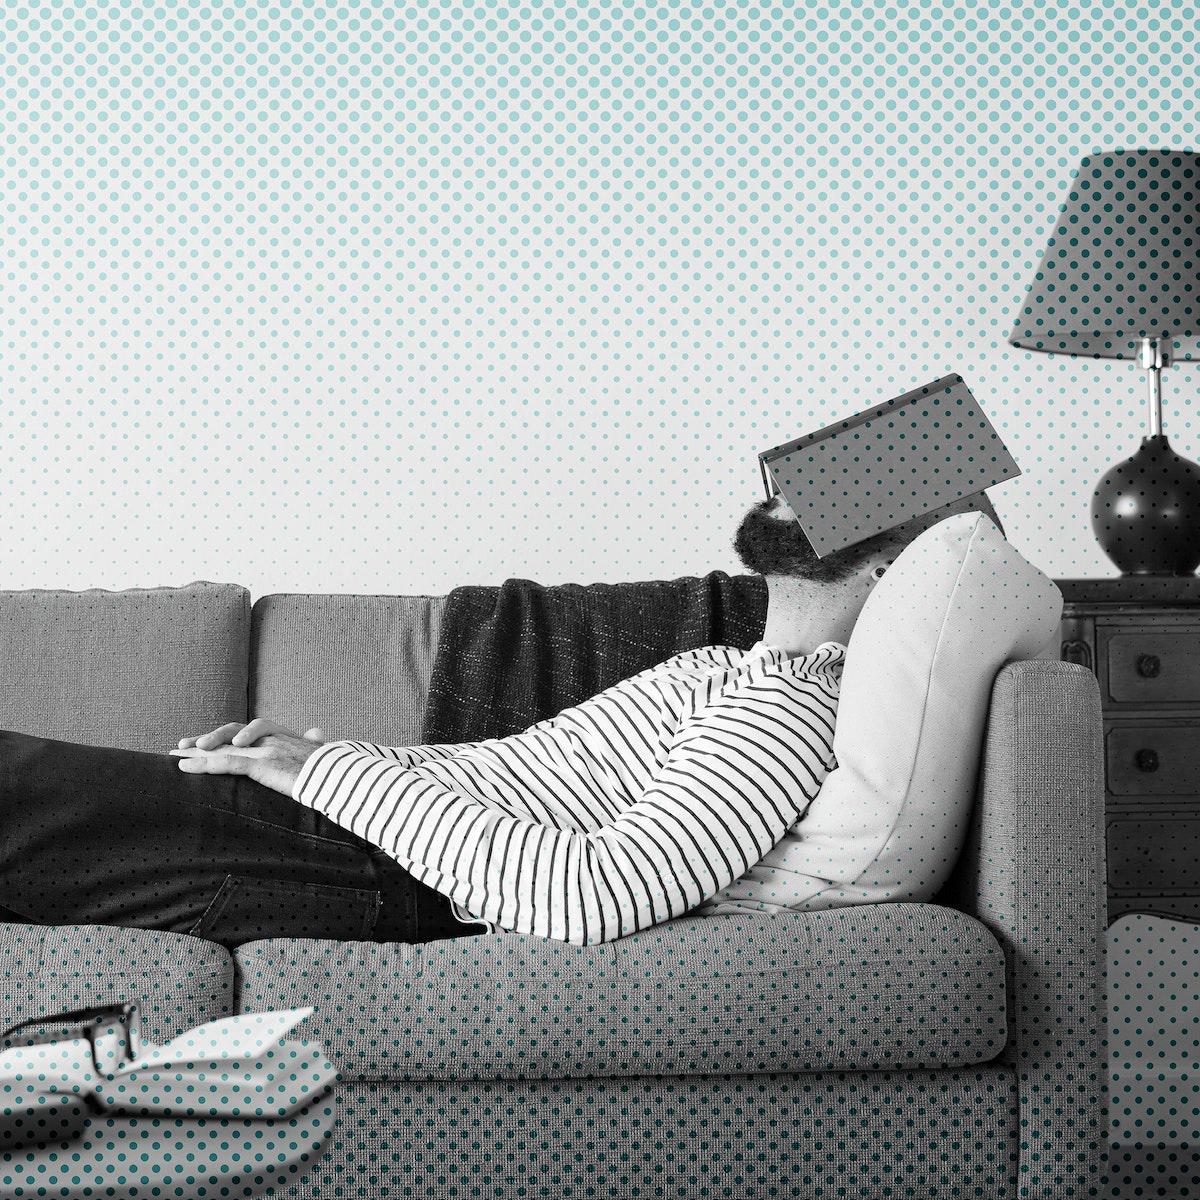 Man getting bored at home during coronavirus quarantine